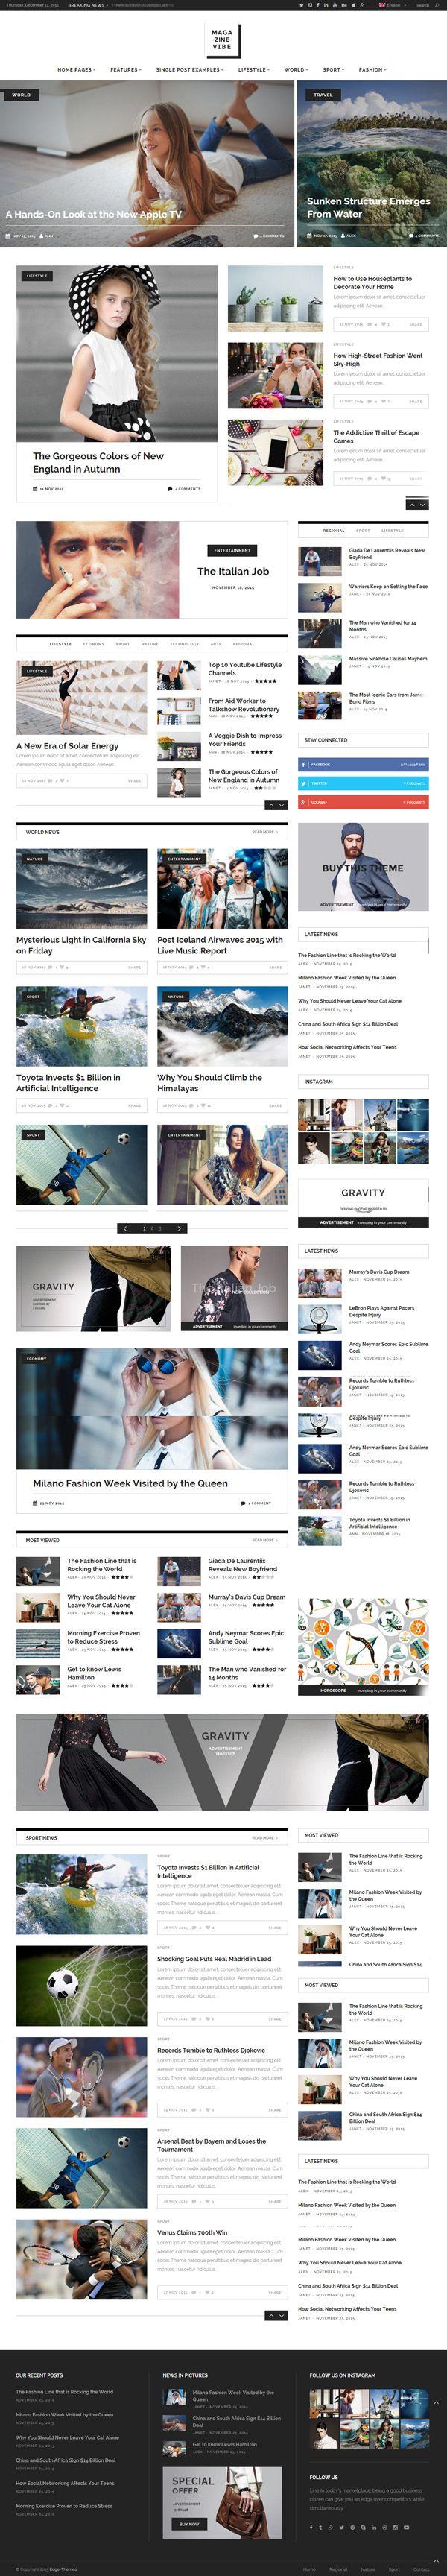 Magazine Vibe - A Powerful News & Magazine Theme #responsivedesign #html5 #css3 #wordpressthemes #seo #premiumthemes